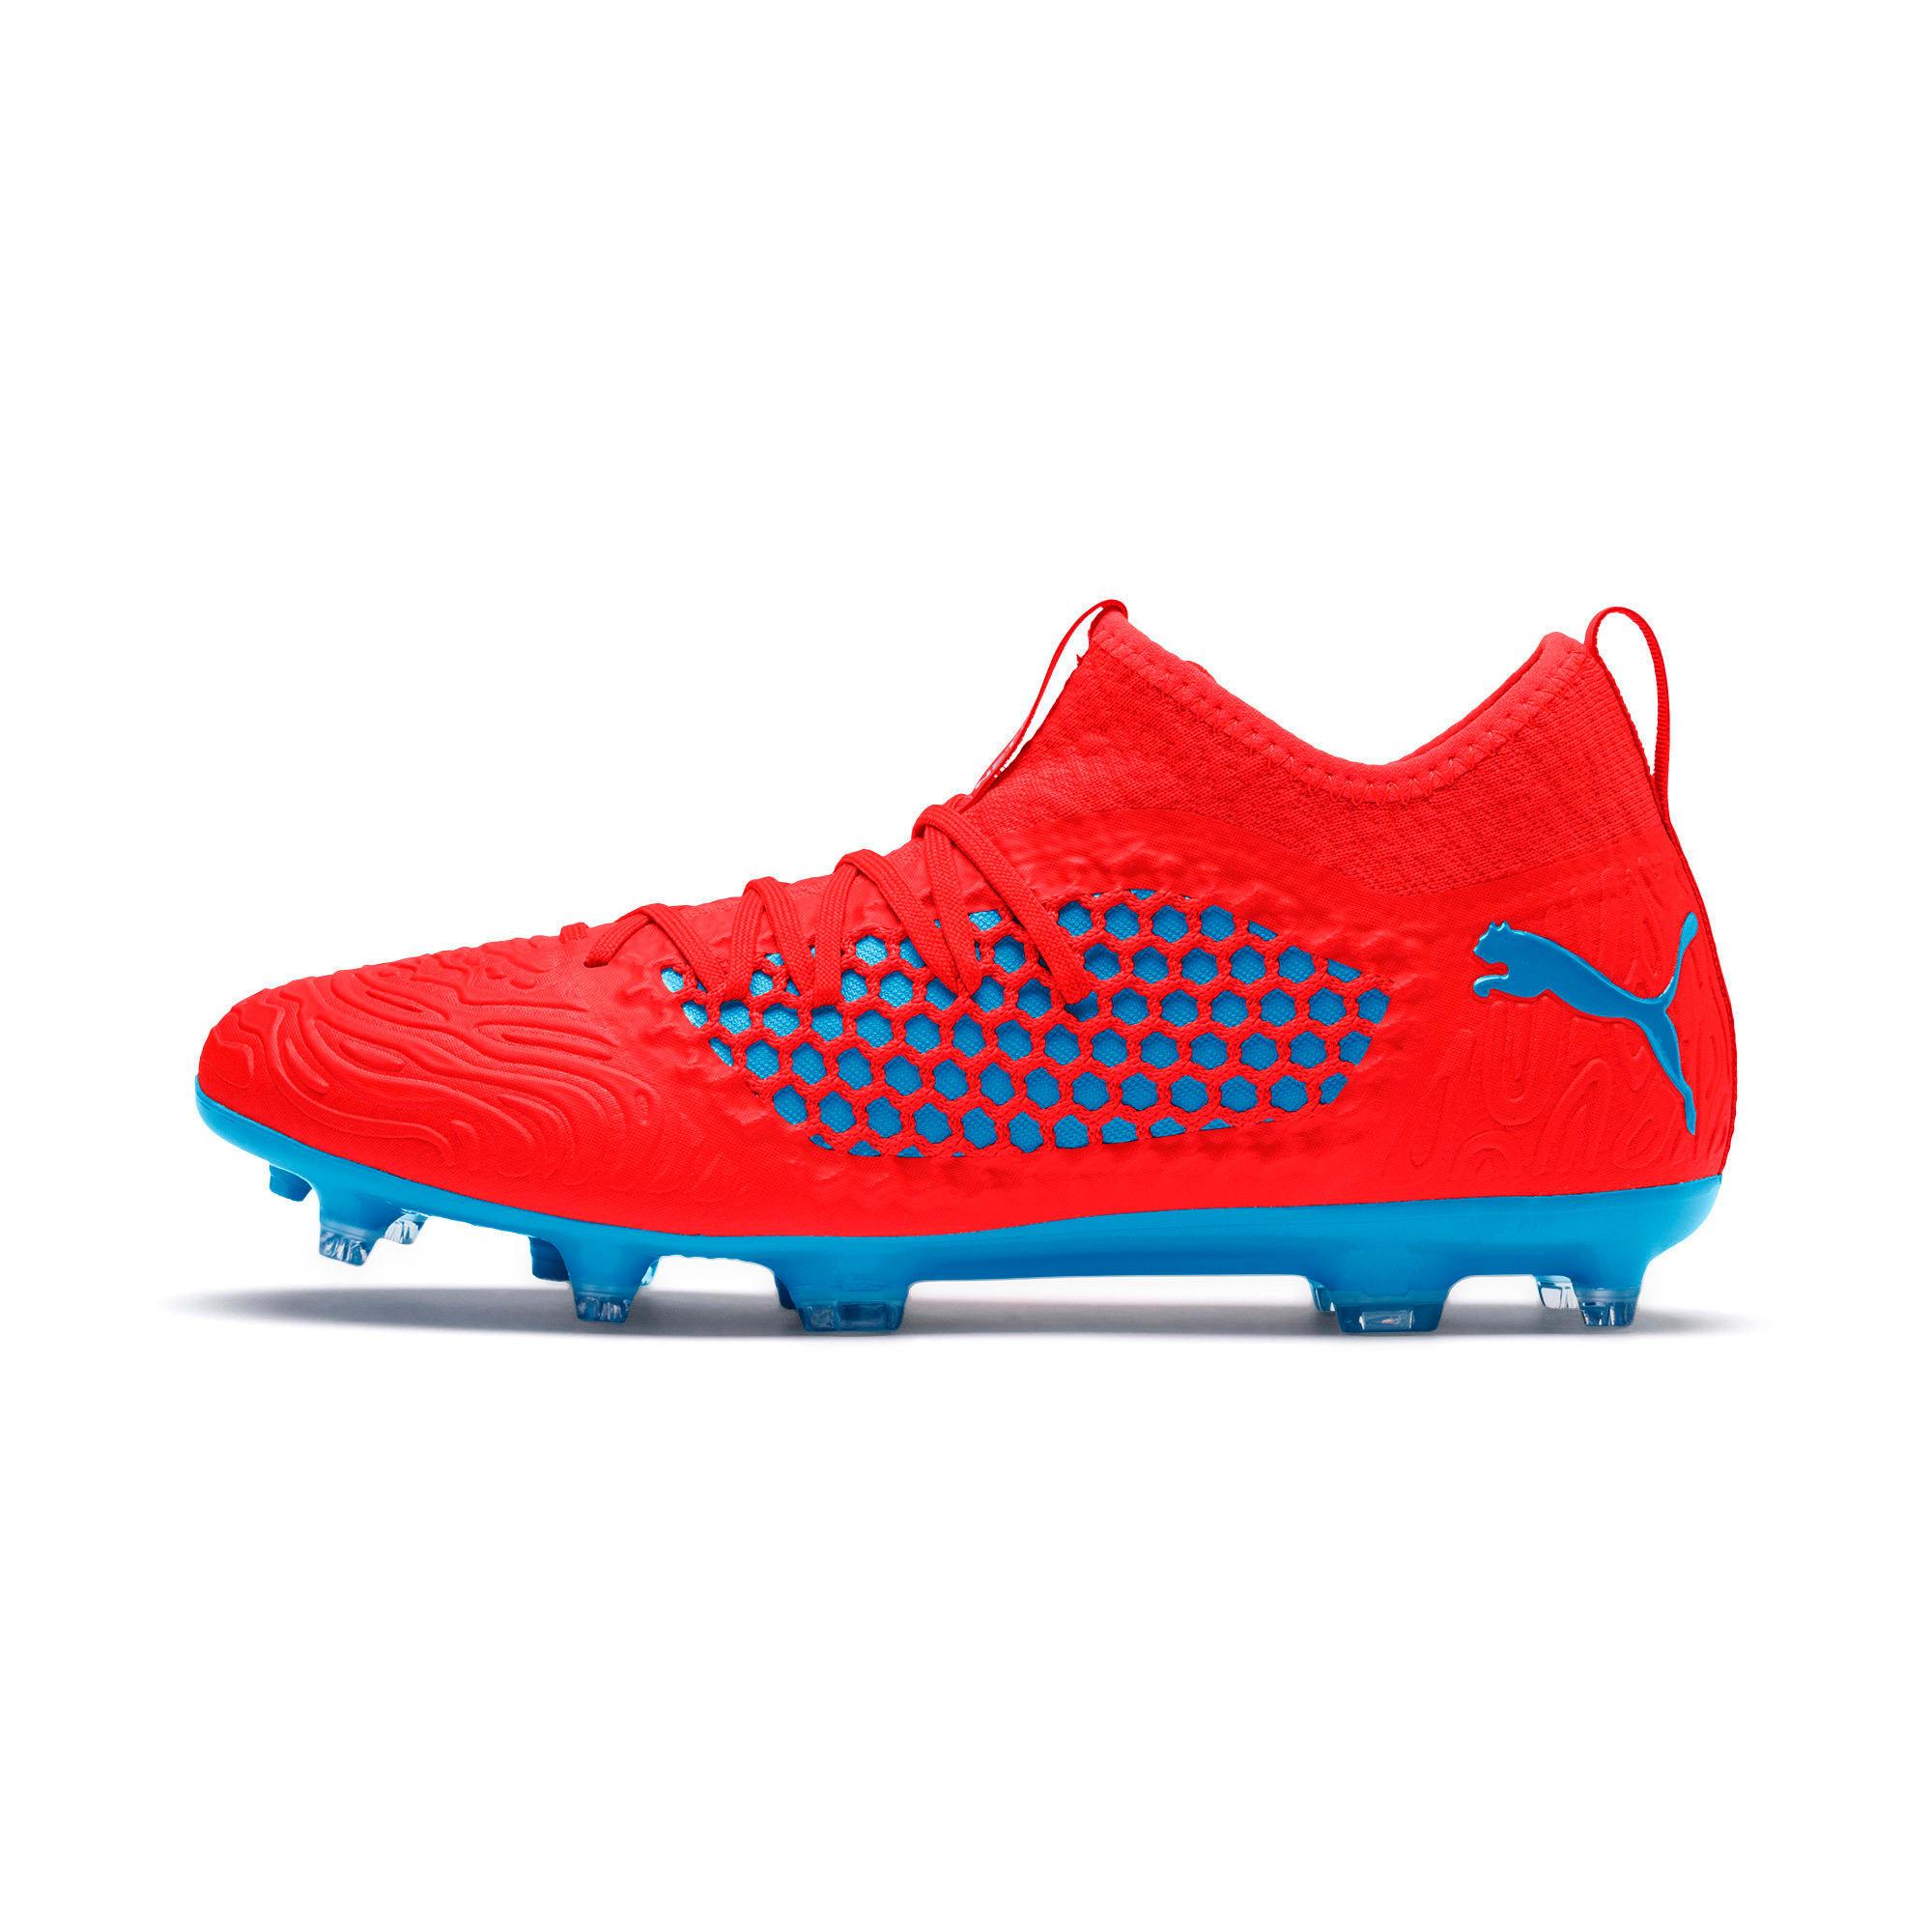 Thumbnail 1 of FUTURE 19.3 NETFIT FG/AG Men's Football Boots, Red Blast-Bleu Azur, medium-IND